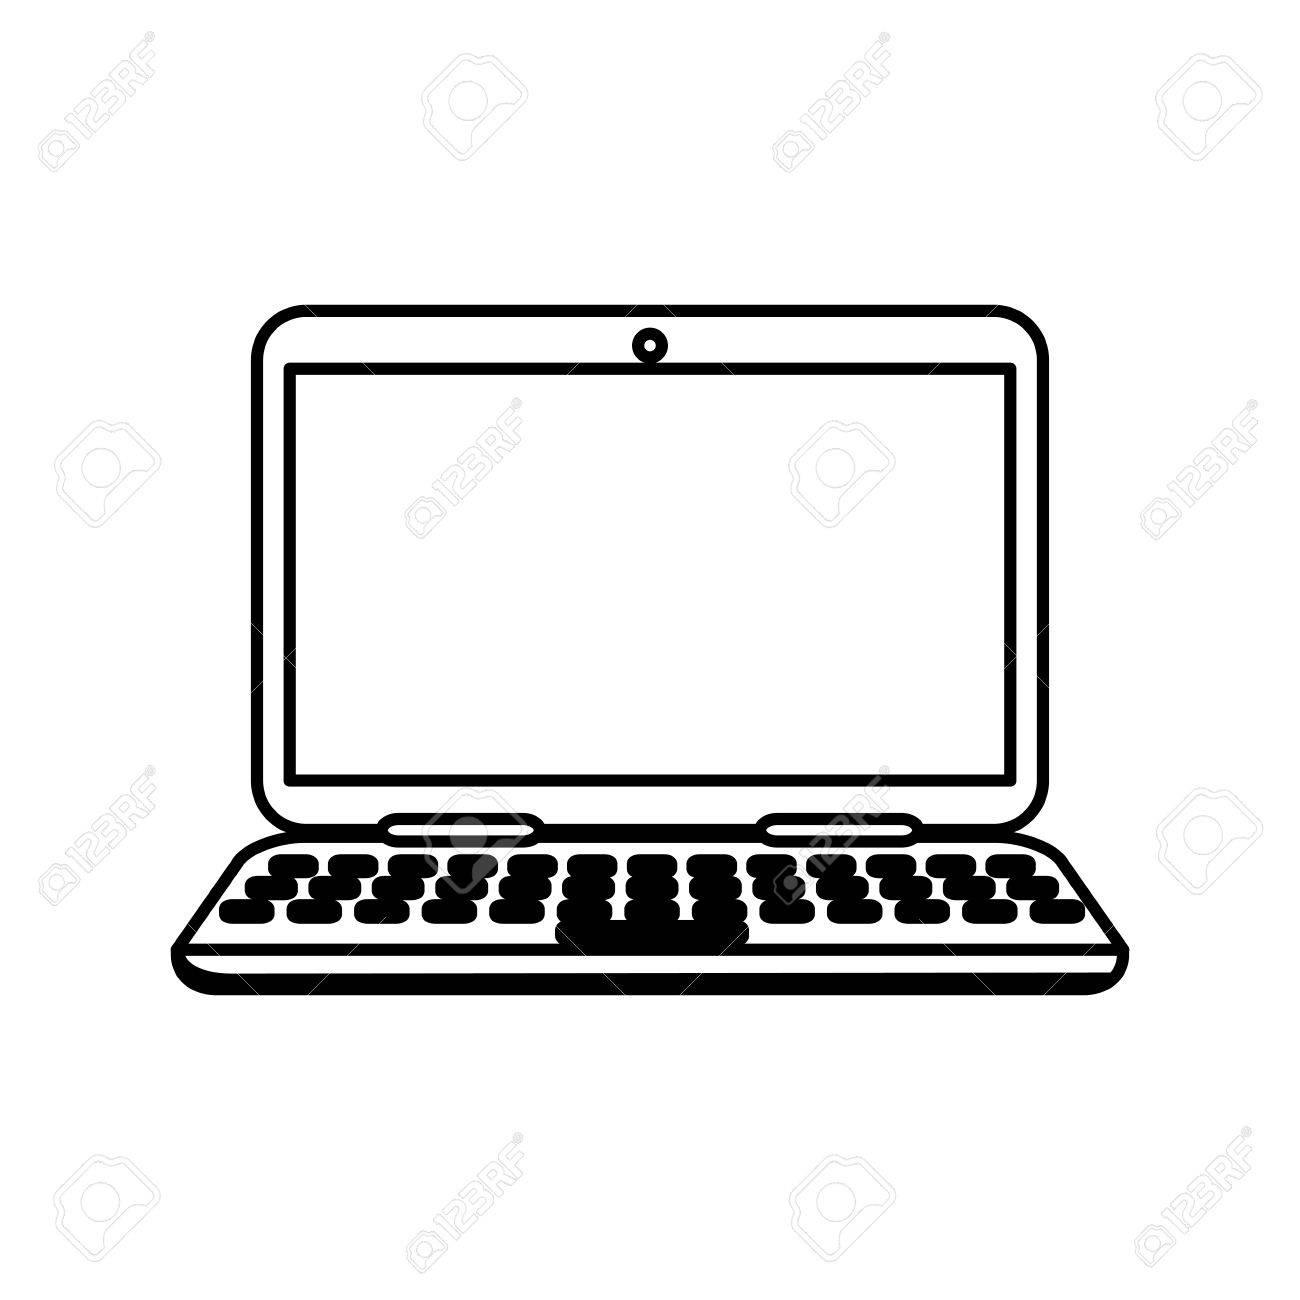 laptop computer technology icon vector illustration graphic design